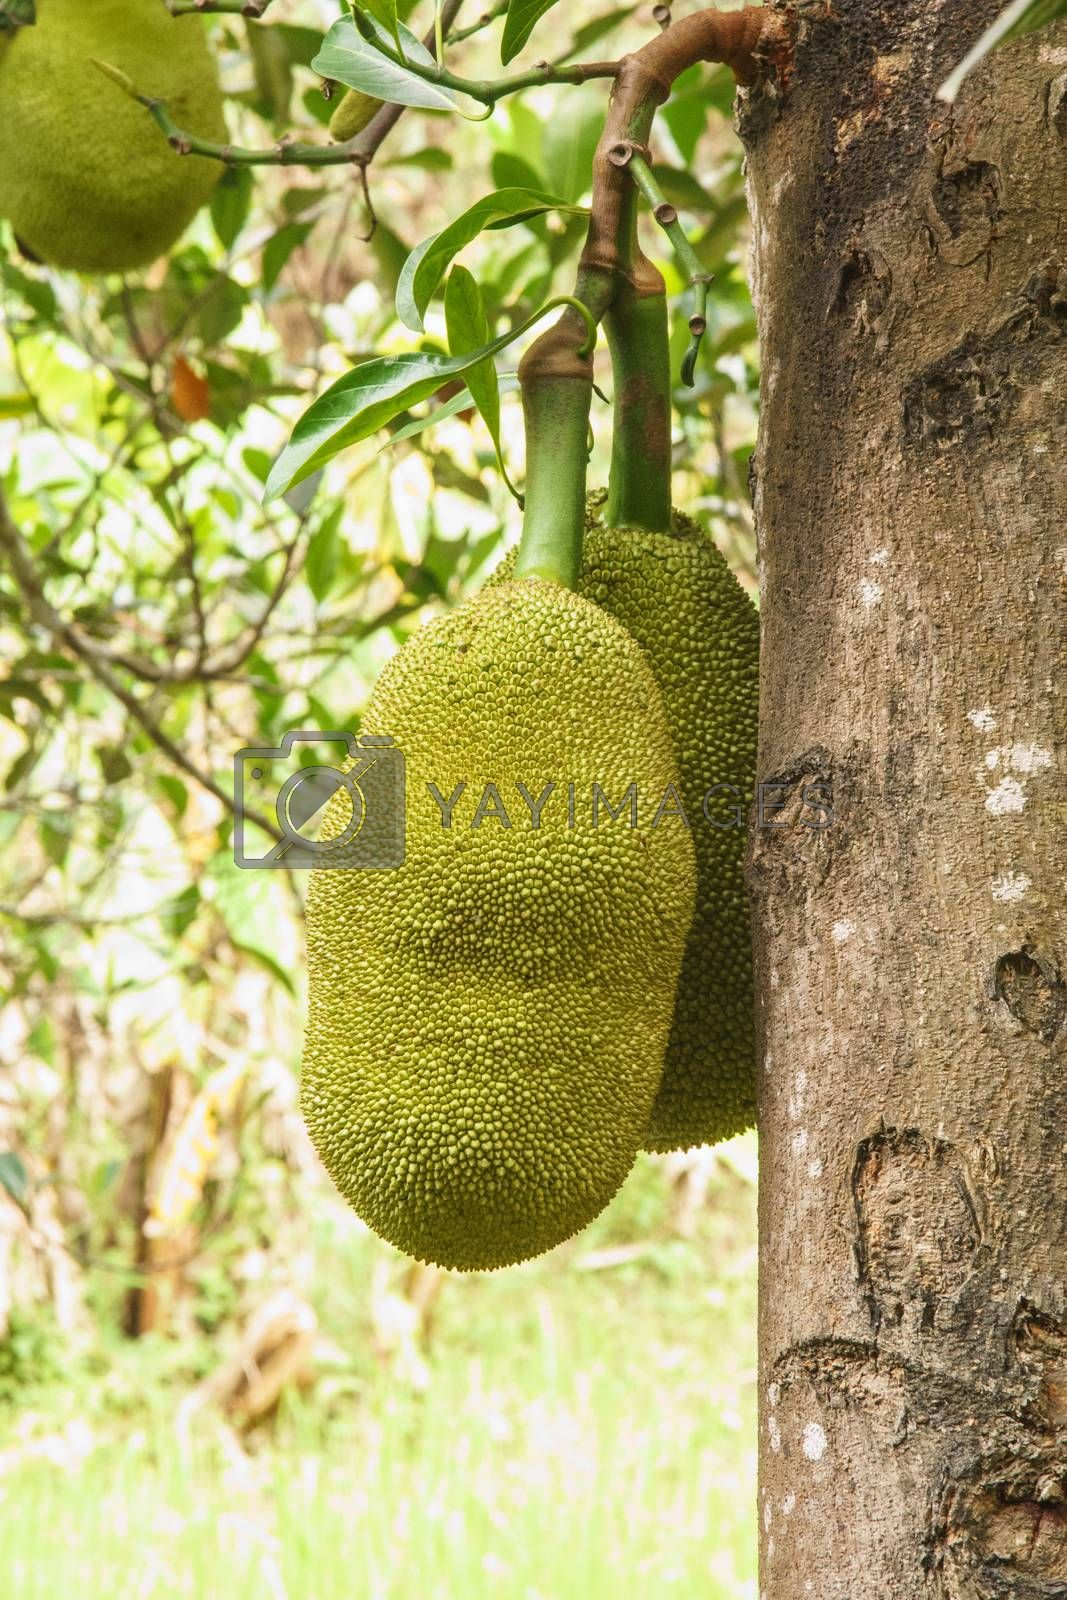 Royalty free image of jackfruit by nattapatt